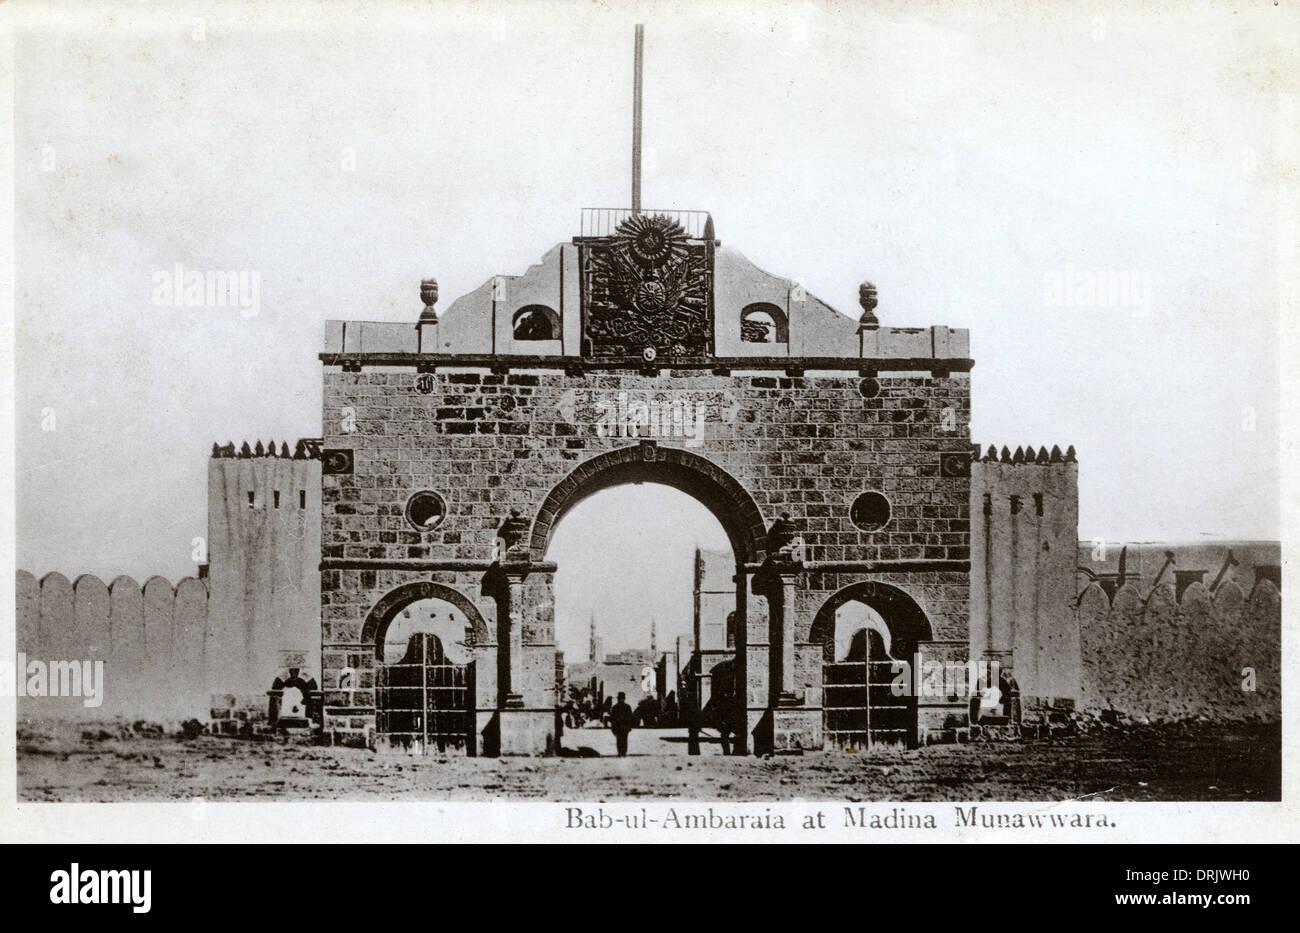 Bab Ul Ambaraia Gate - Medina, Saudi Arabia, - Stock Image